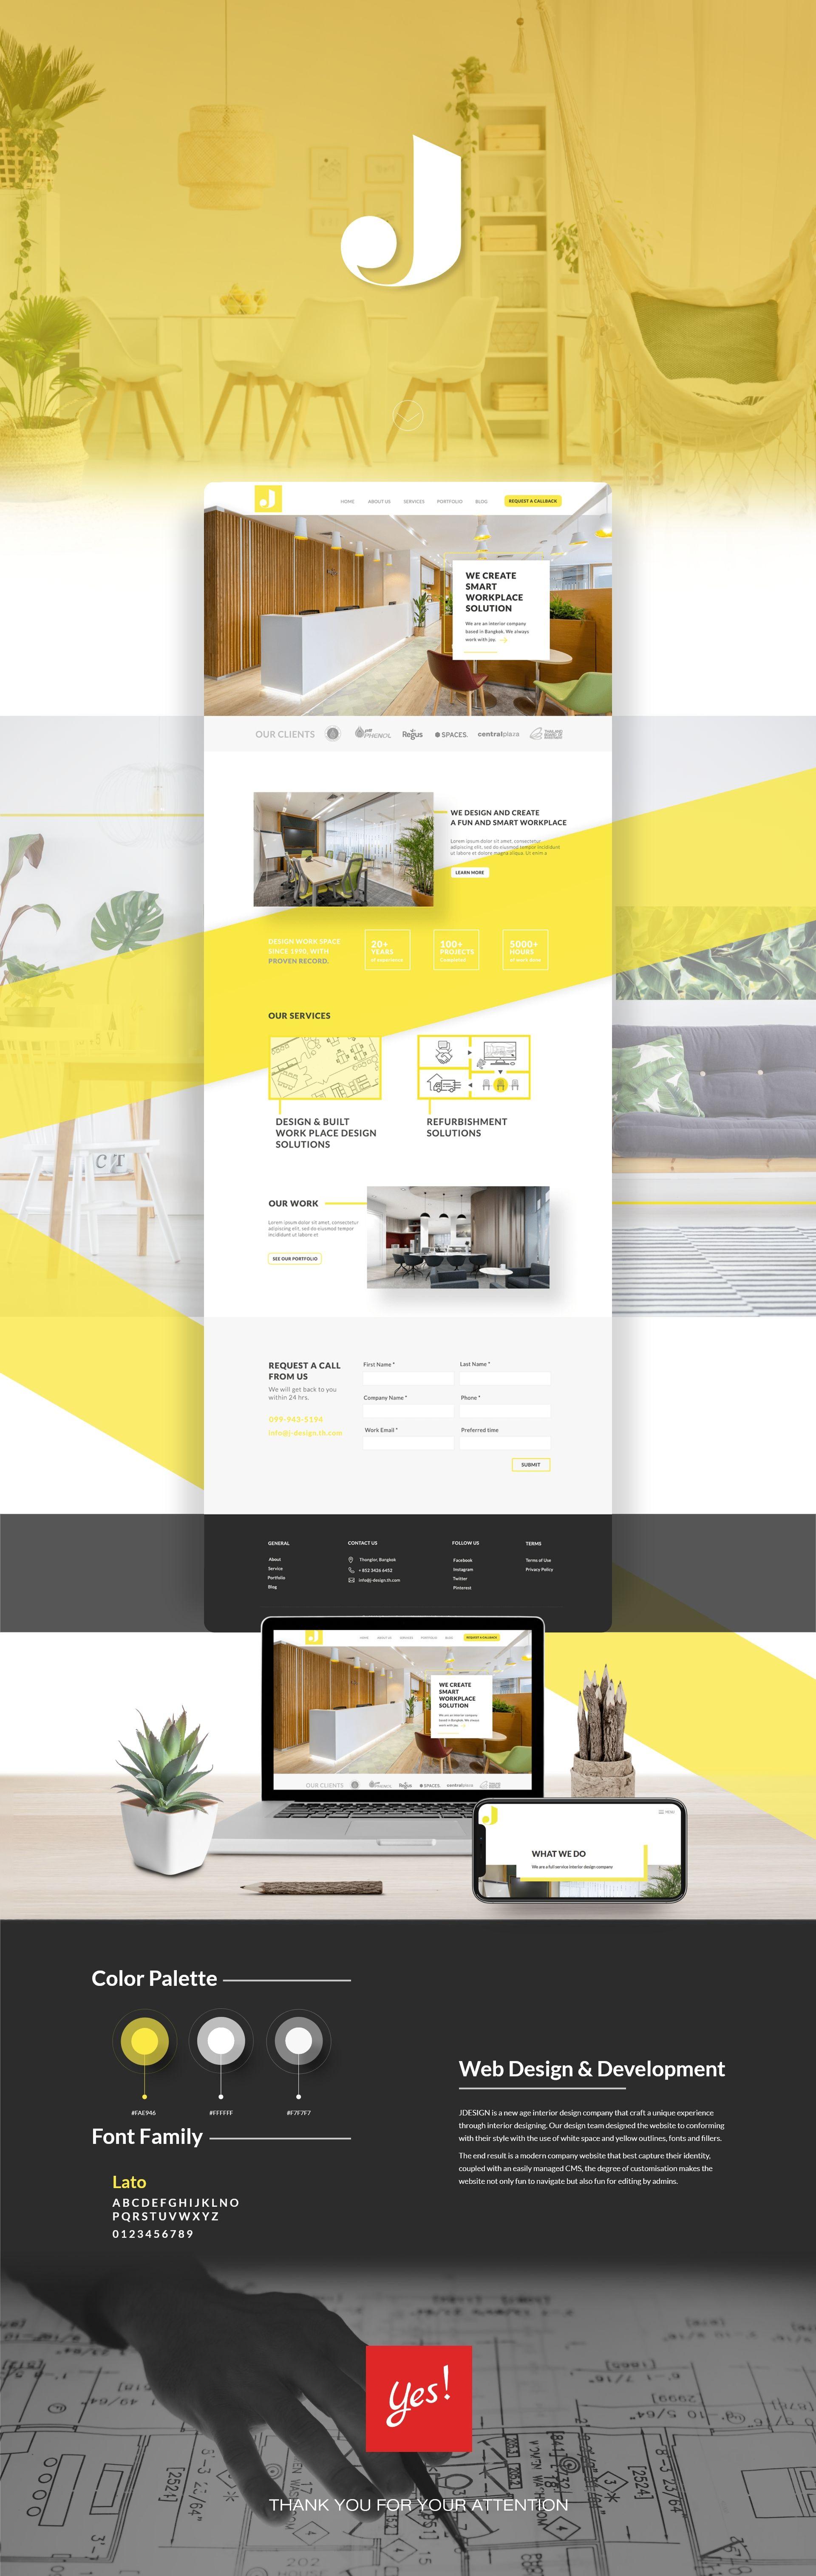 Bangkok Web Design By Yes Web Design Studio Bangkok Thailand